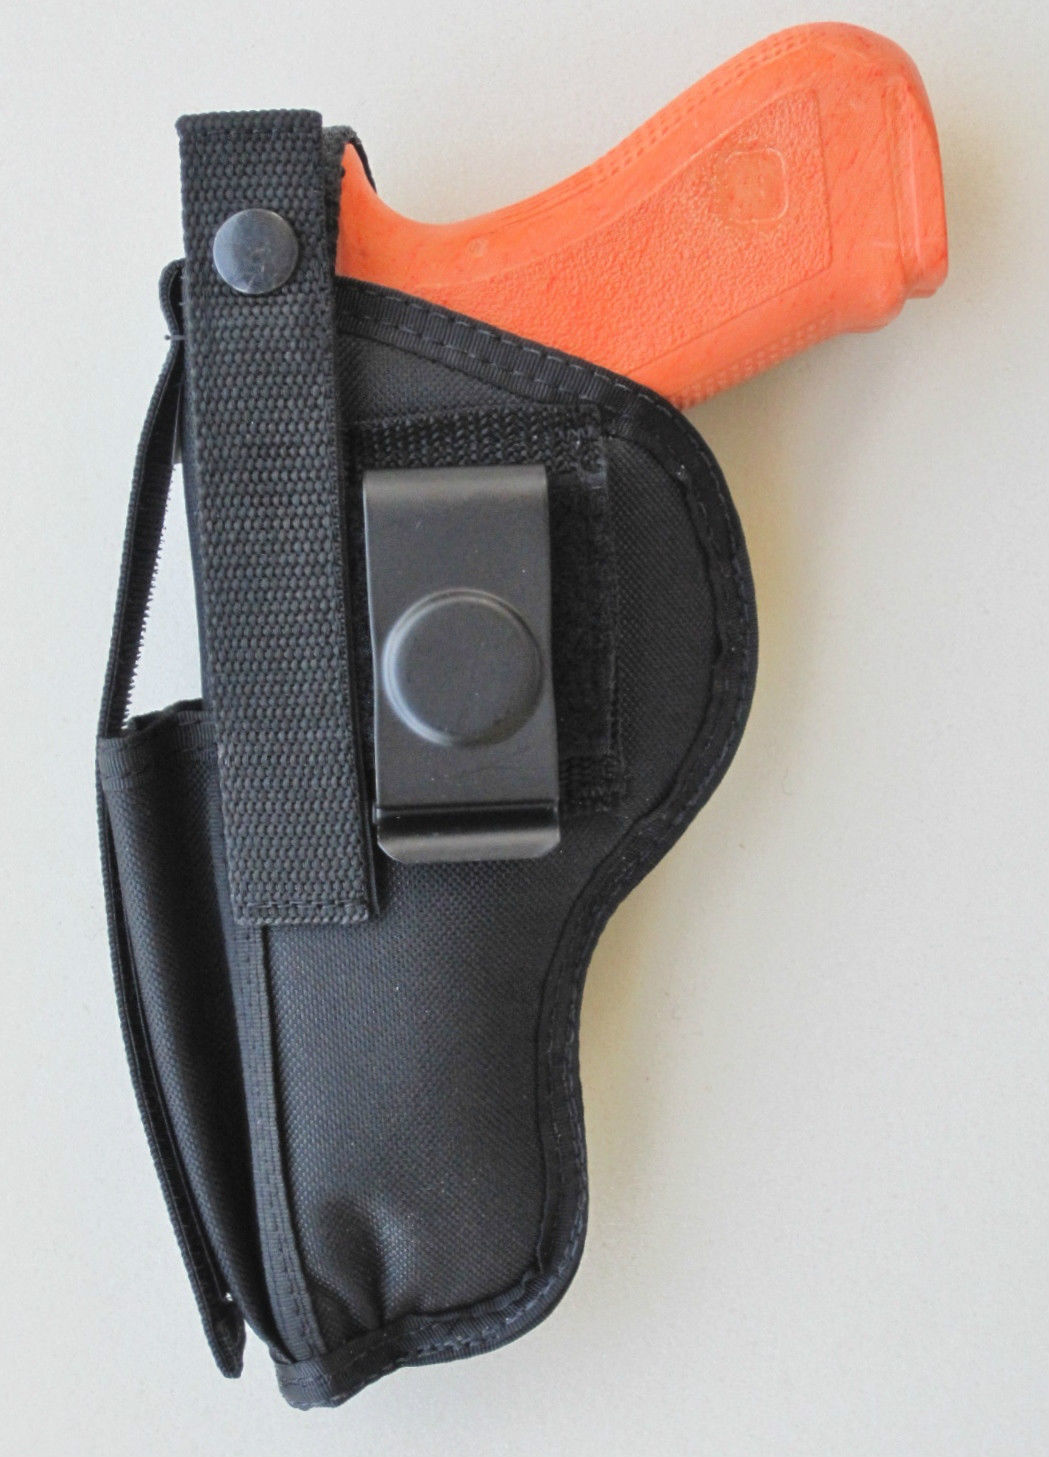 GUN BELT HIP HOLSTER FOR SMITH /& WESSON 40VE,9VE